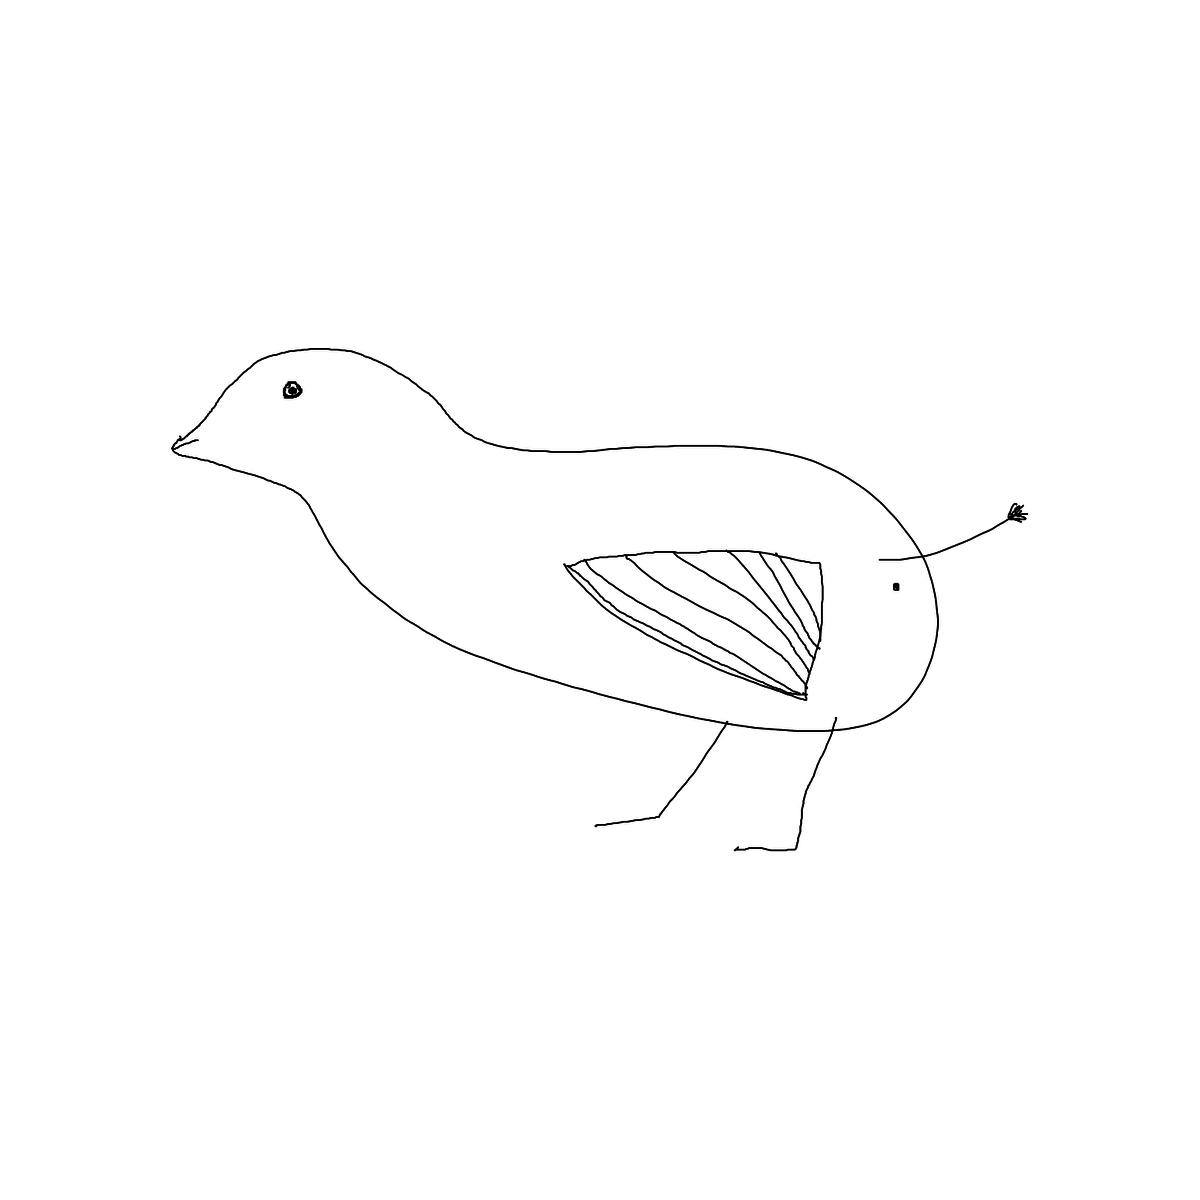 BAAAM drawing#4338 lat:52.4748764038085940lng: 13.4072208404541020